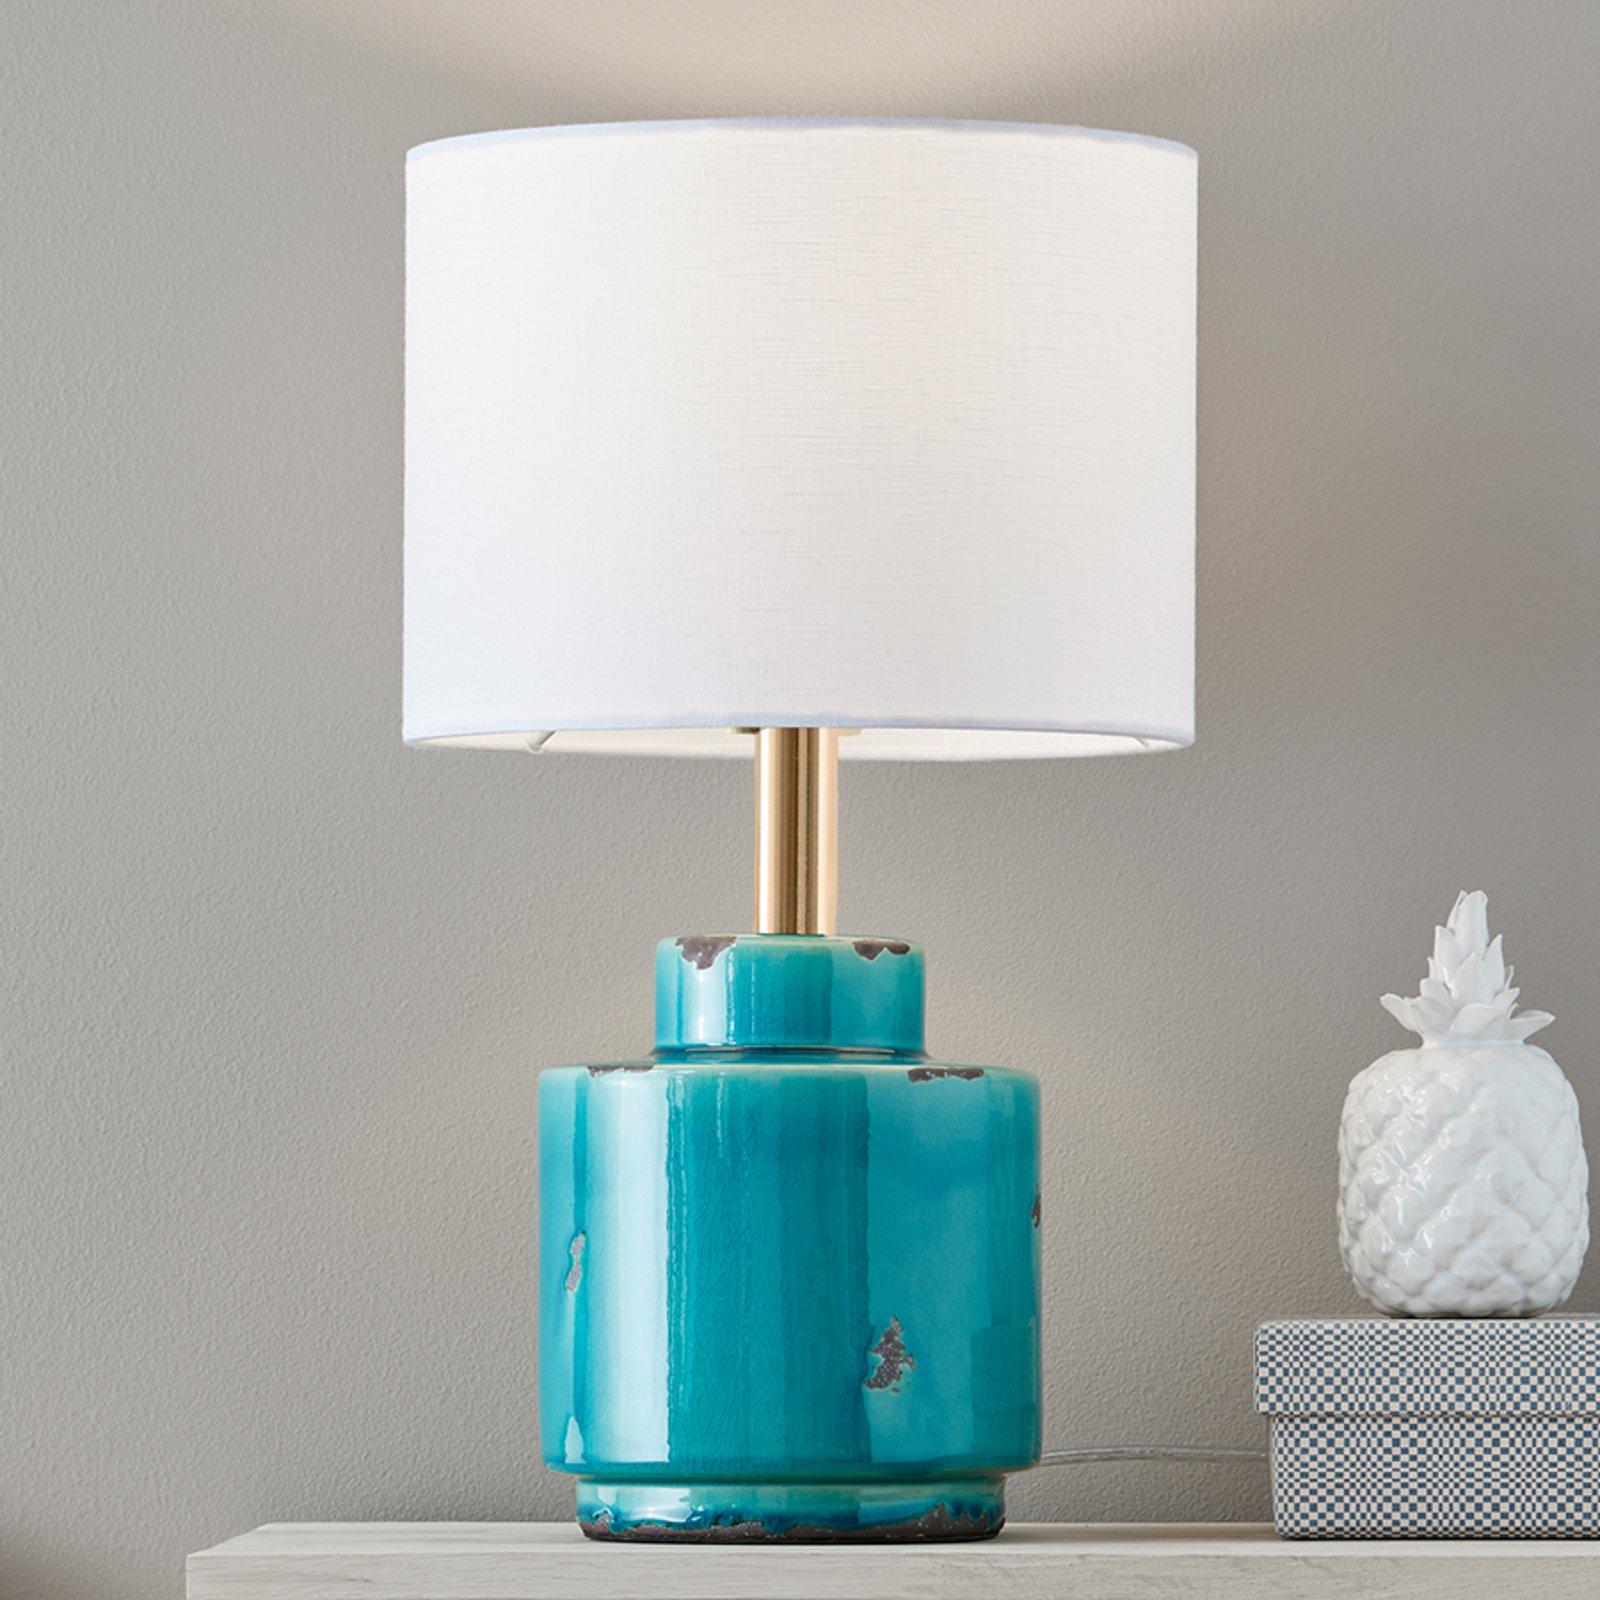 Tekstilbordlampe Cous med keramikkfot